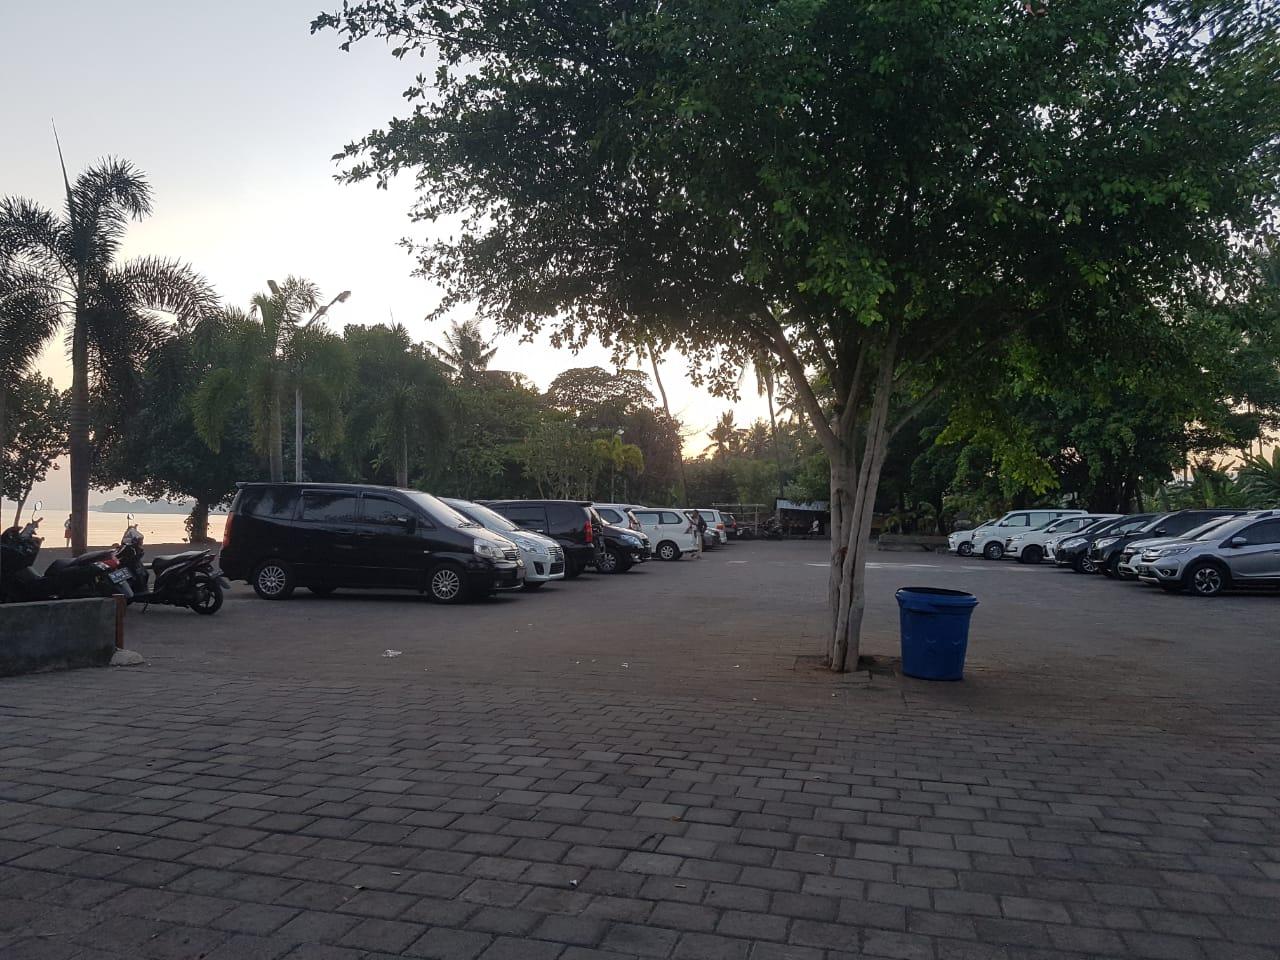 parkir pantai celuk agung lovina